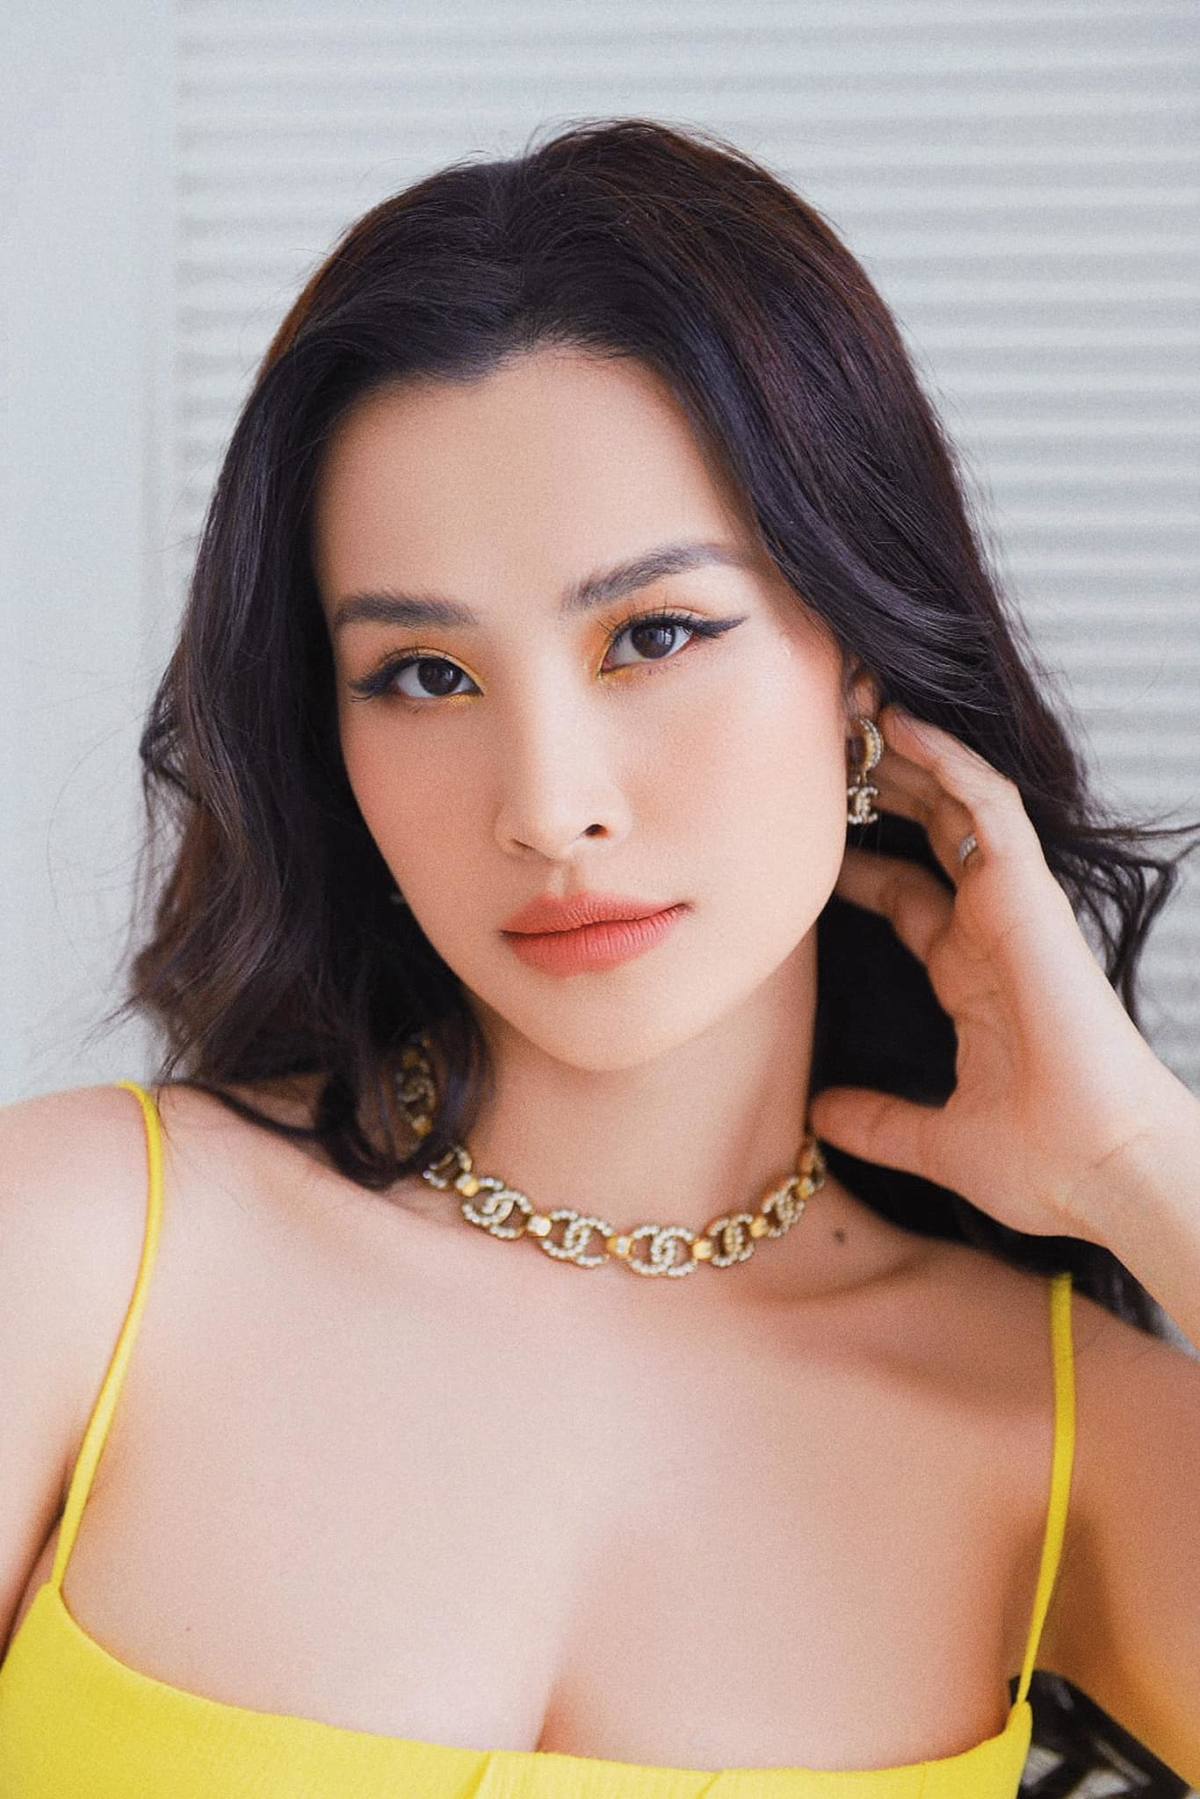 Dong-Nhi-tuoi-324-1634034517.jpg?w=1200&h=0&q=100&dpr=1&fit=crop&s=CrPVz_9-3tulnvqaQh_xNA